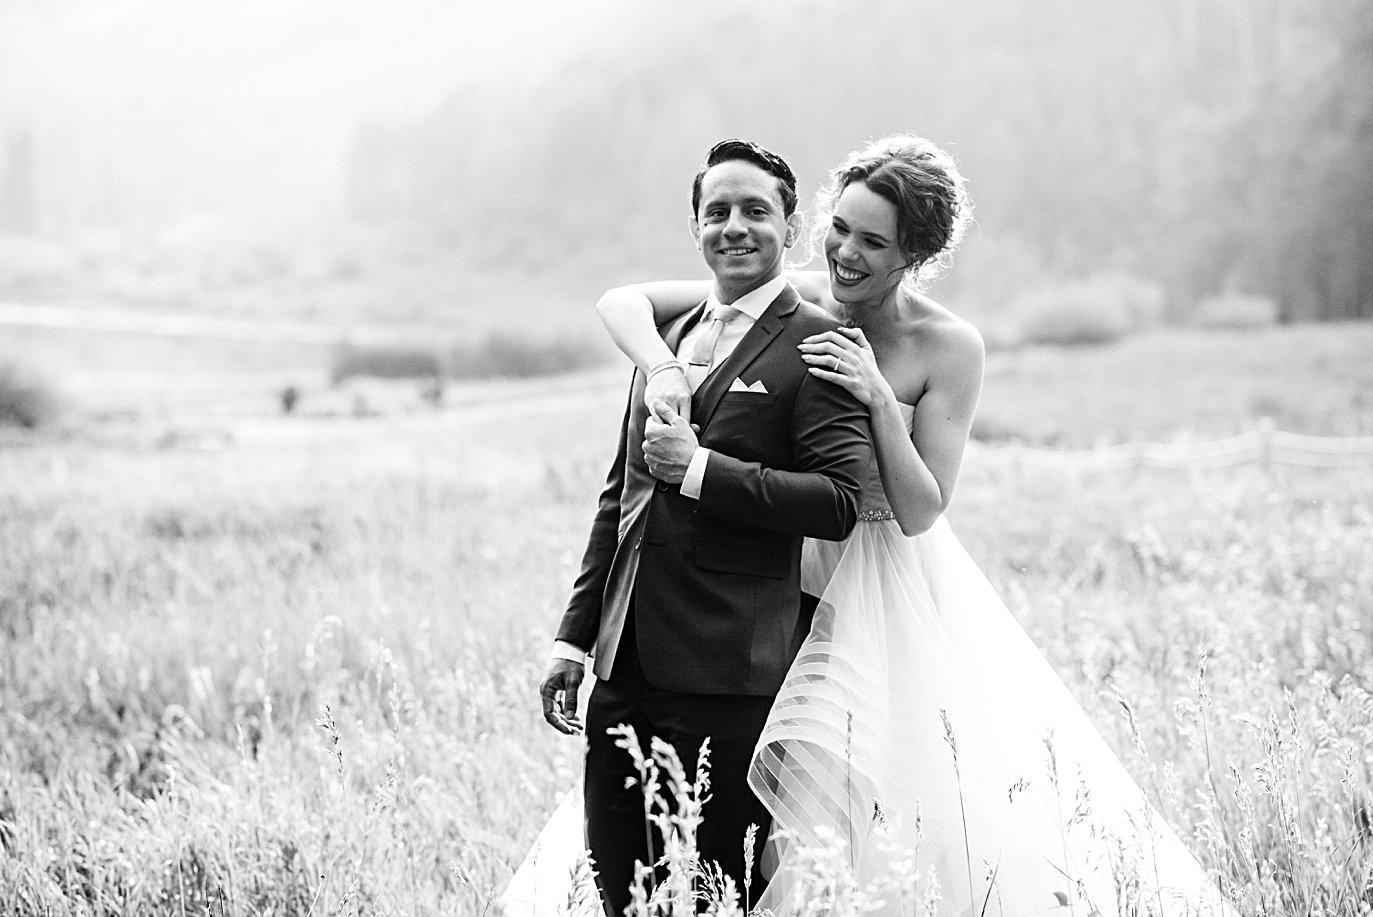 cozy fall at fall Maroon Bells wedding by Aspen wedding photographer Jennie Crate